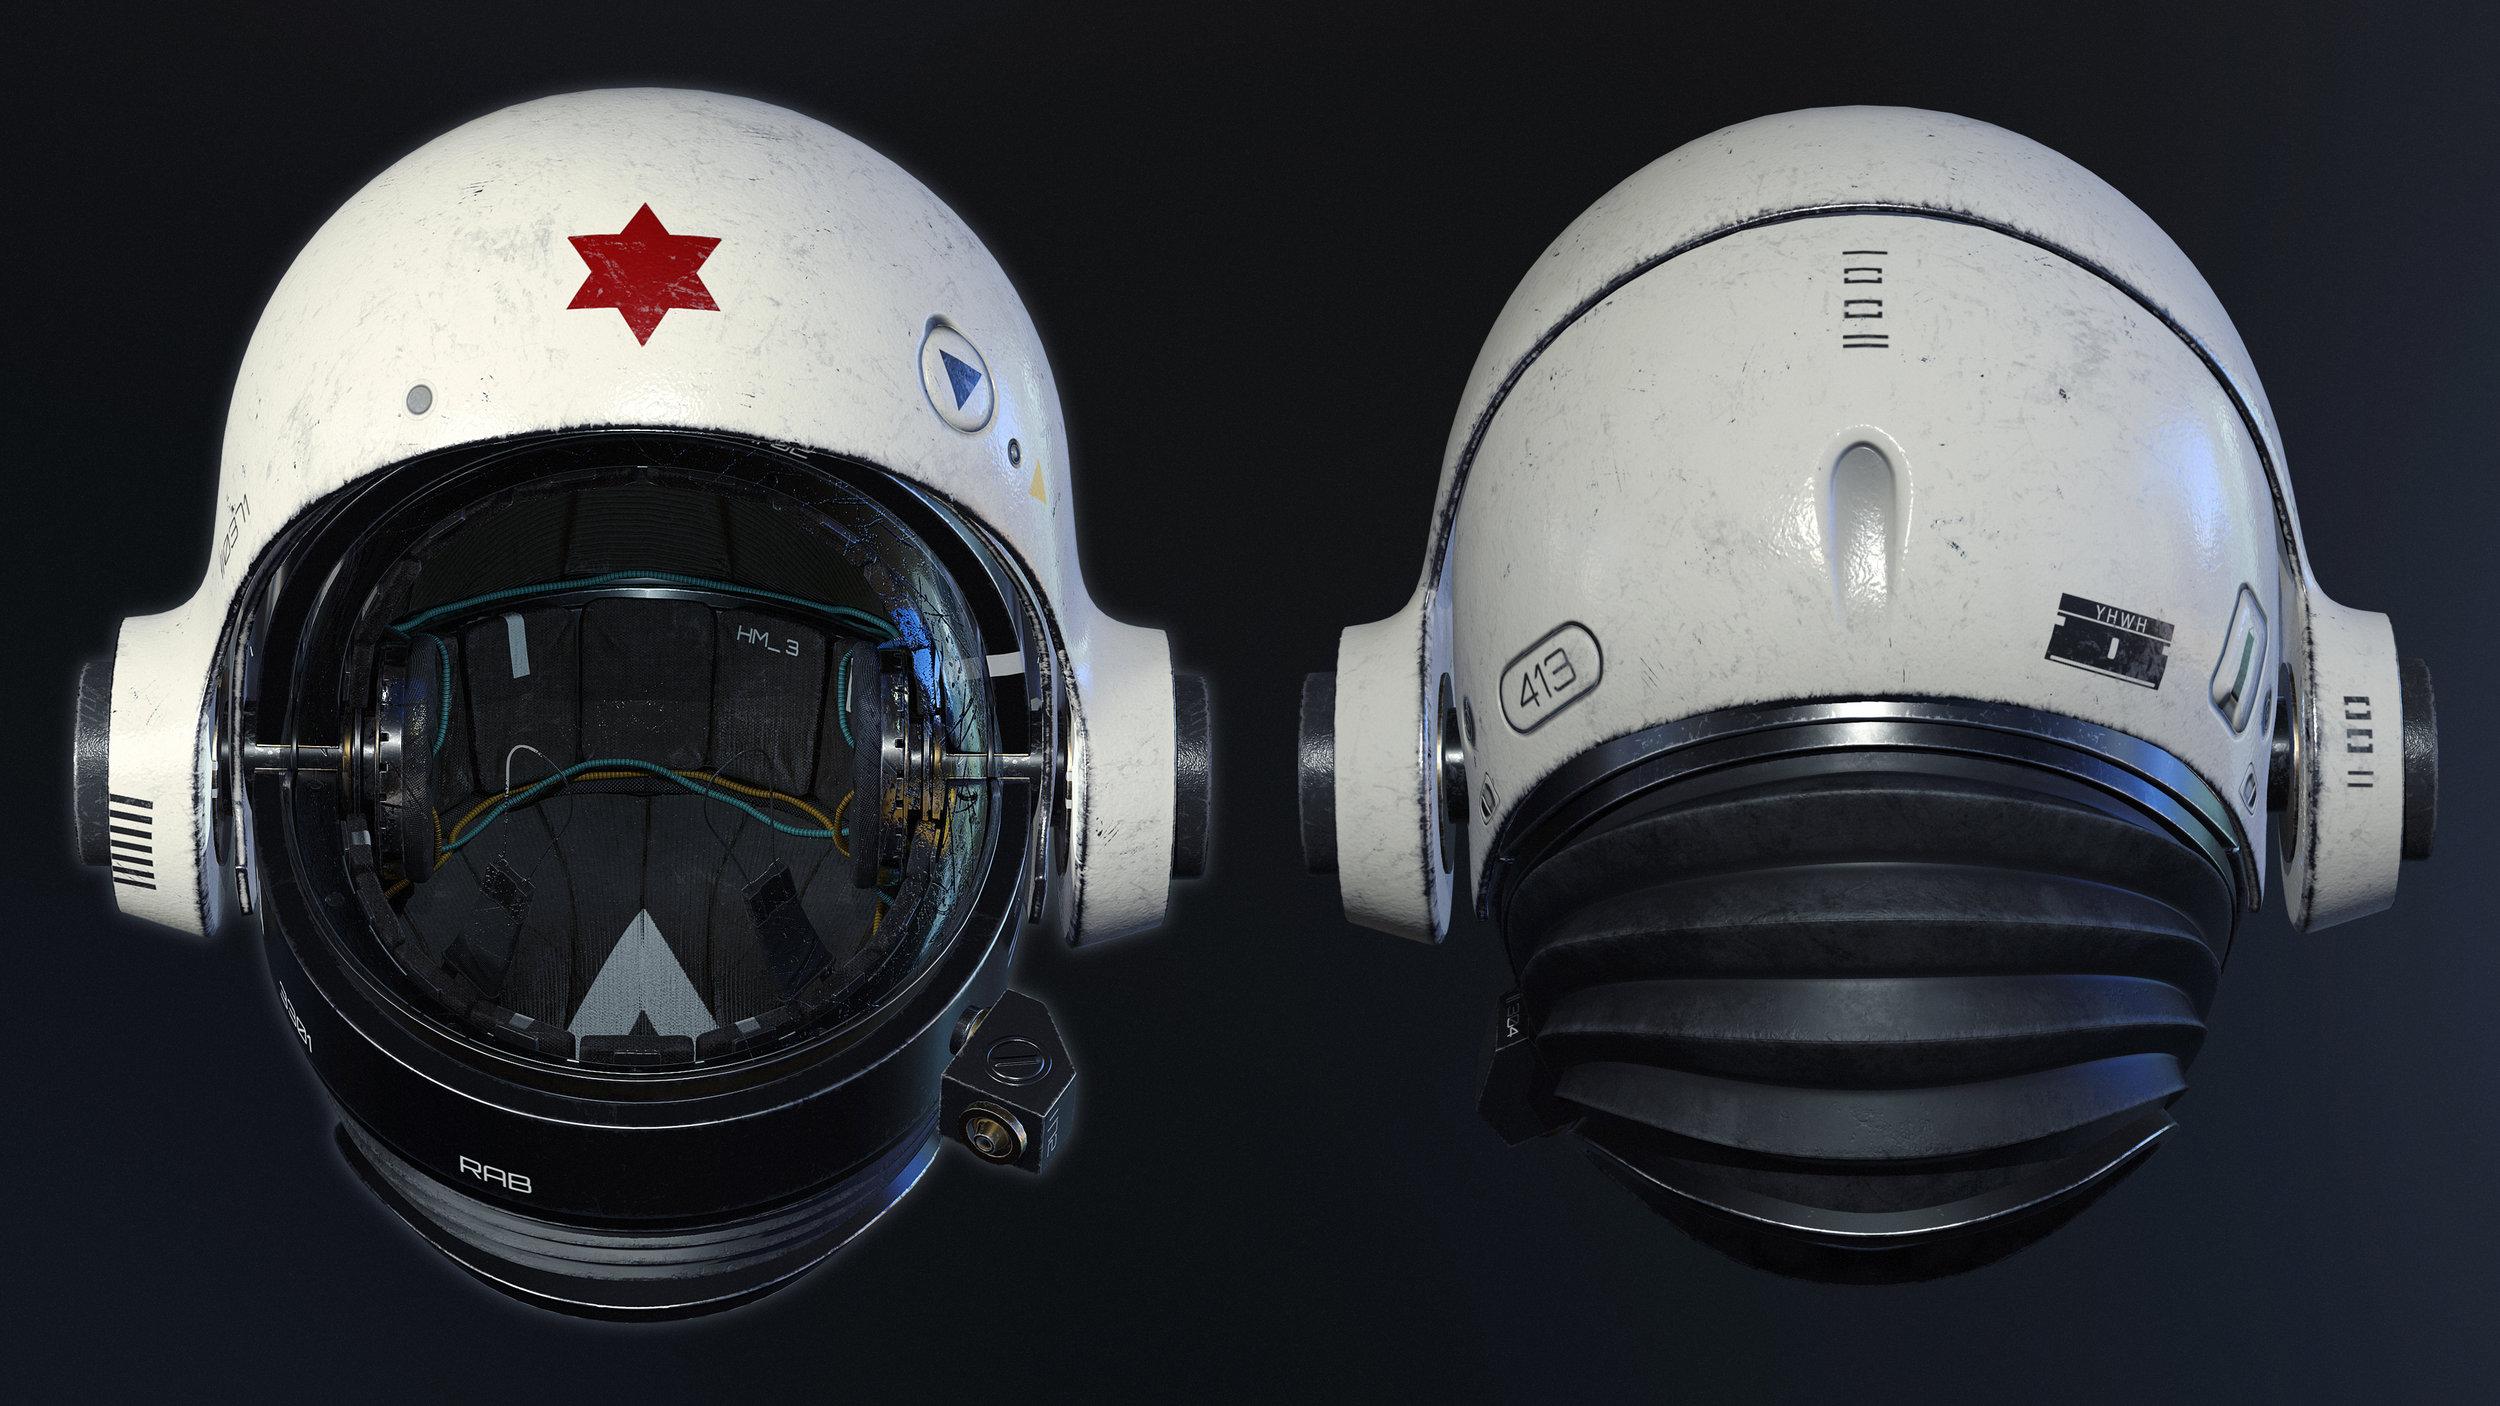 Ryan_Blake_Cosmonaut_Helmet_03_front_back.jpg